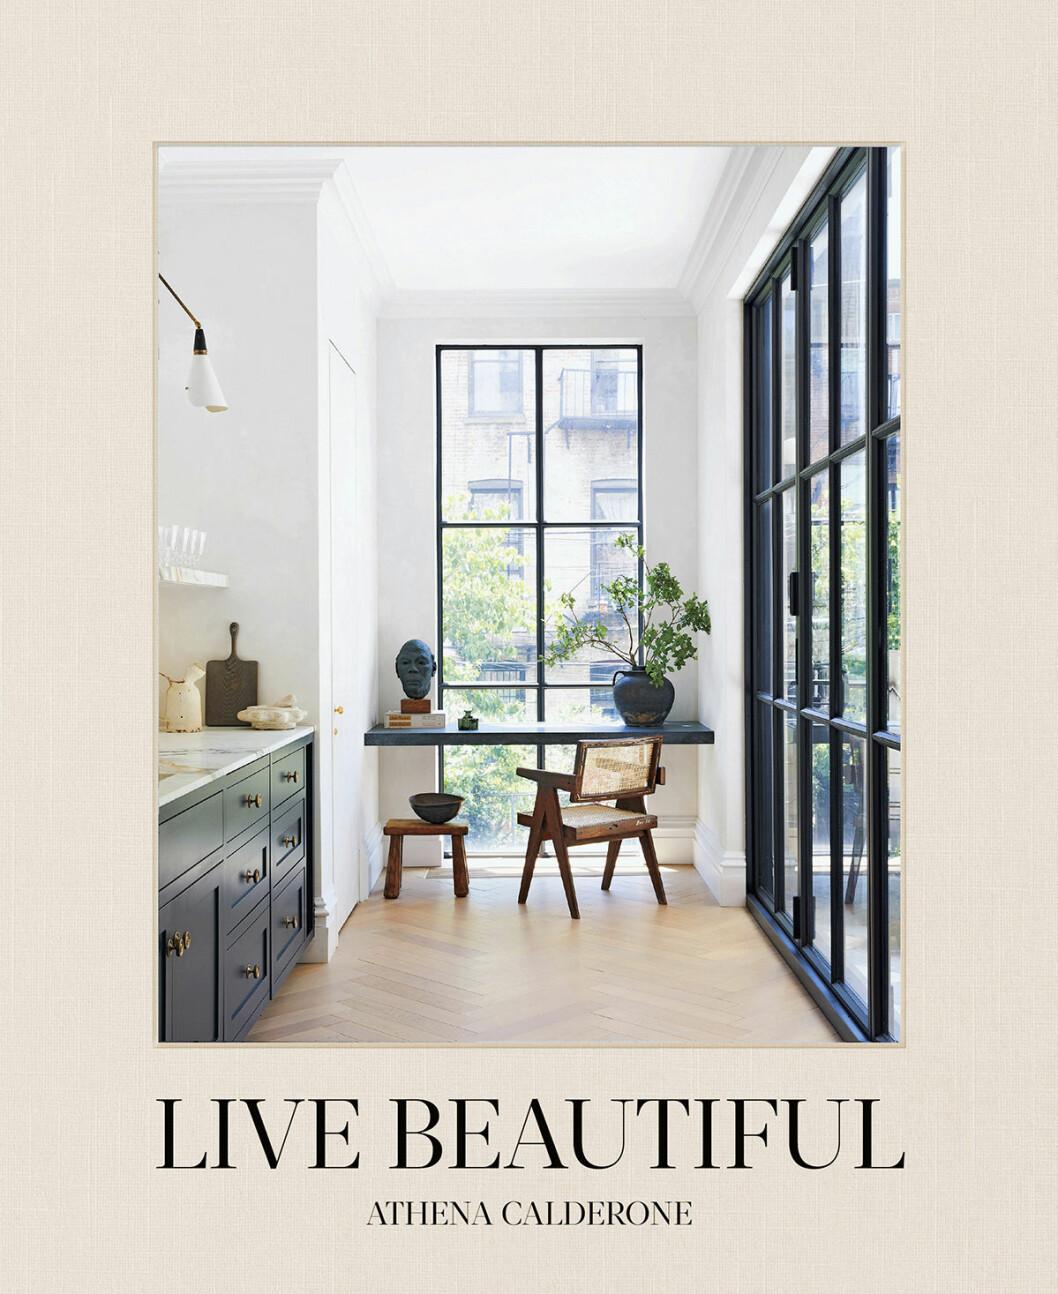 Athena Calderone eyeswoon inredningsbok live beautiful